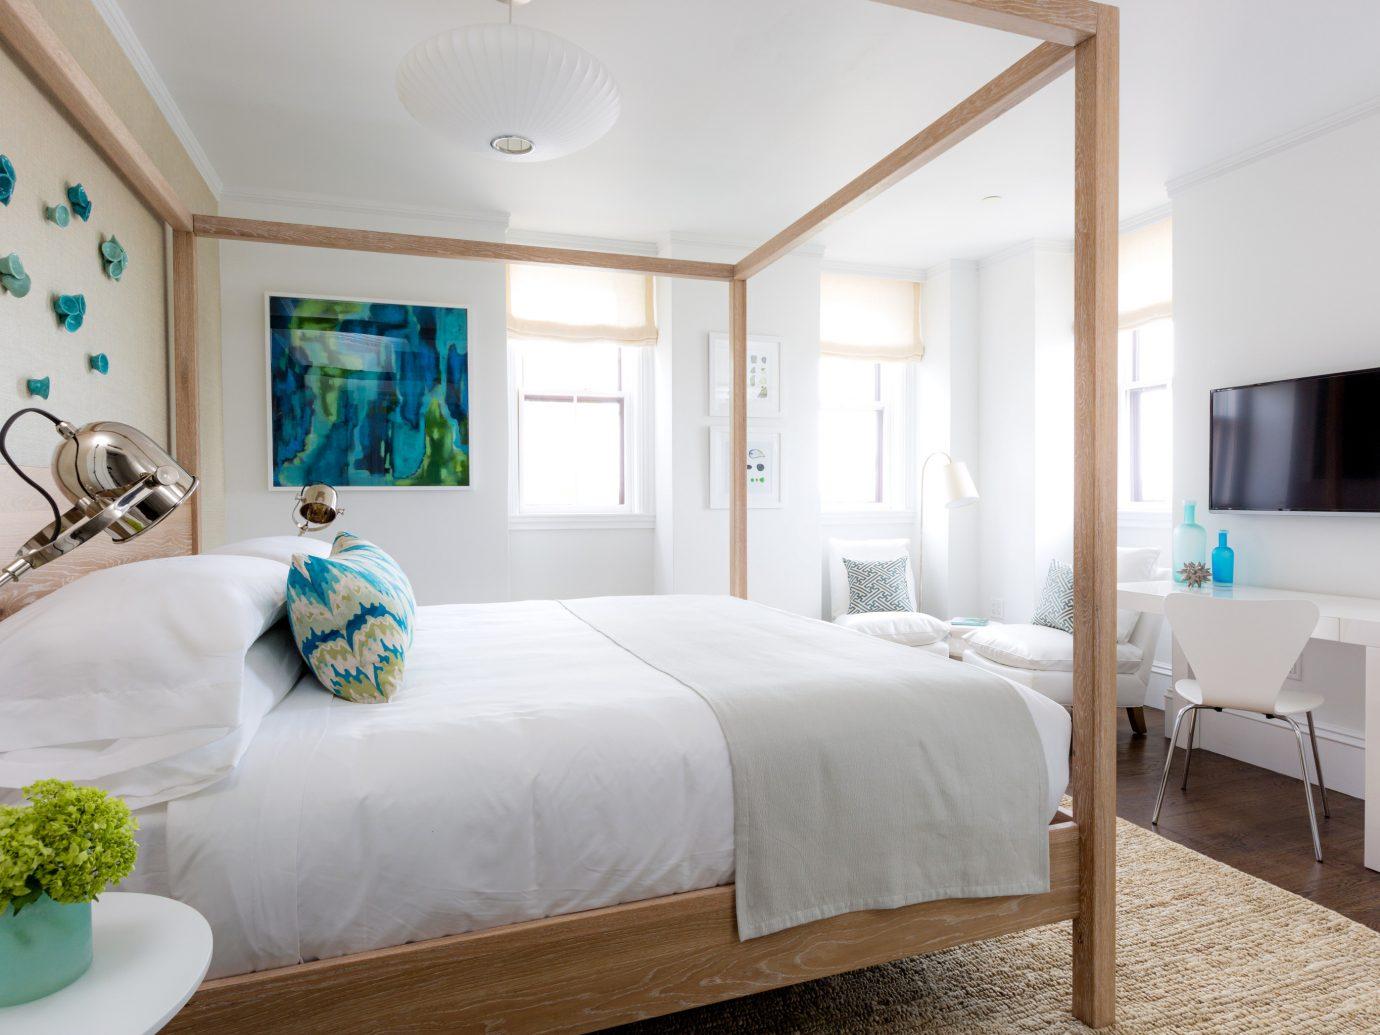 Bedroom at 21 Broad Hotel